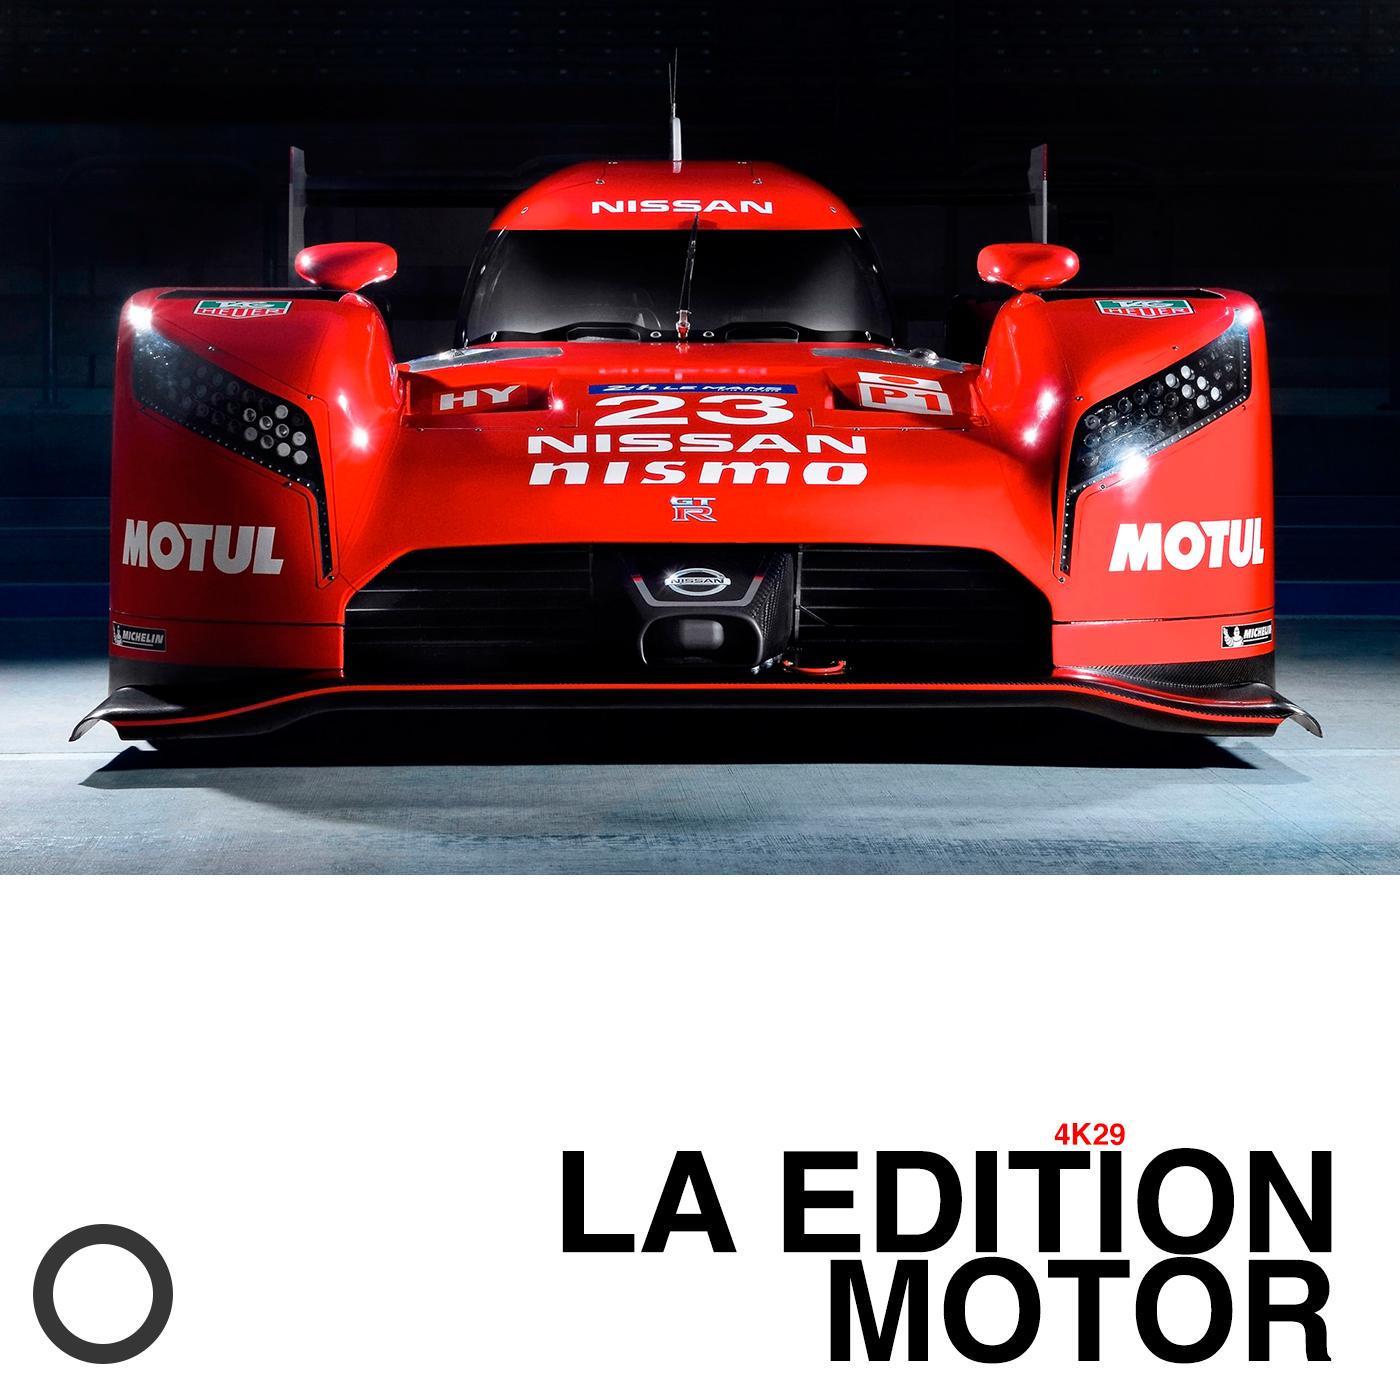 LA EDITION MOTOR 4K29